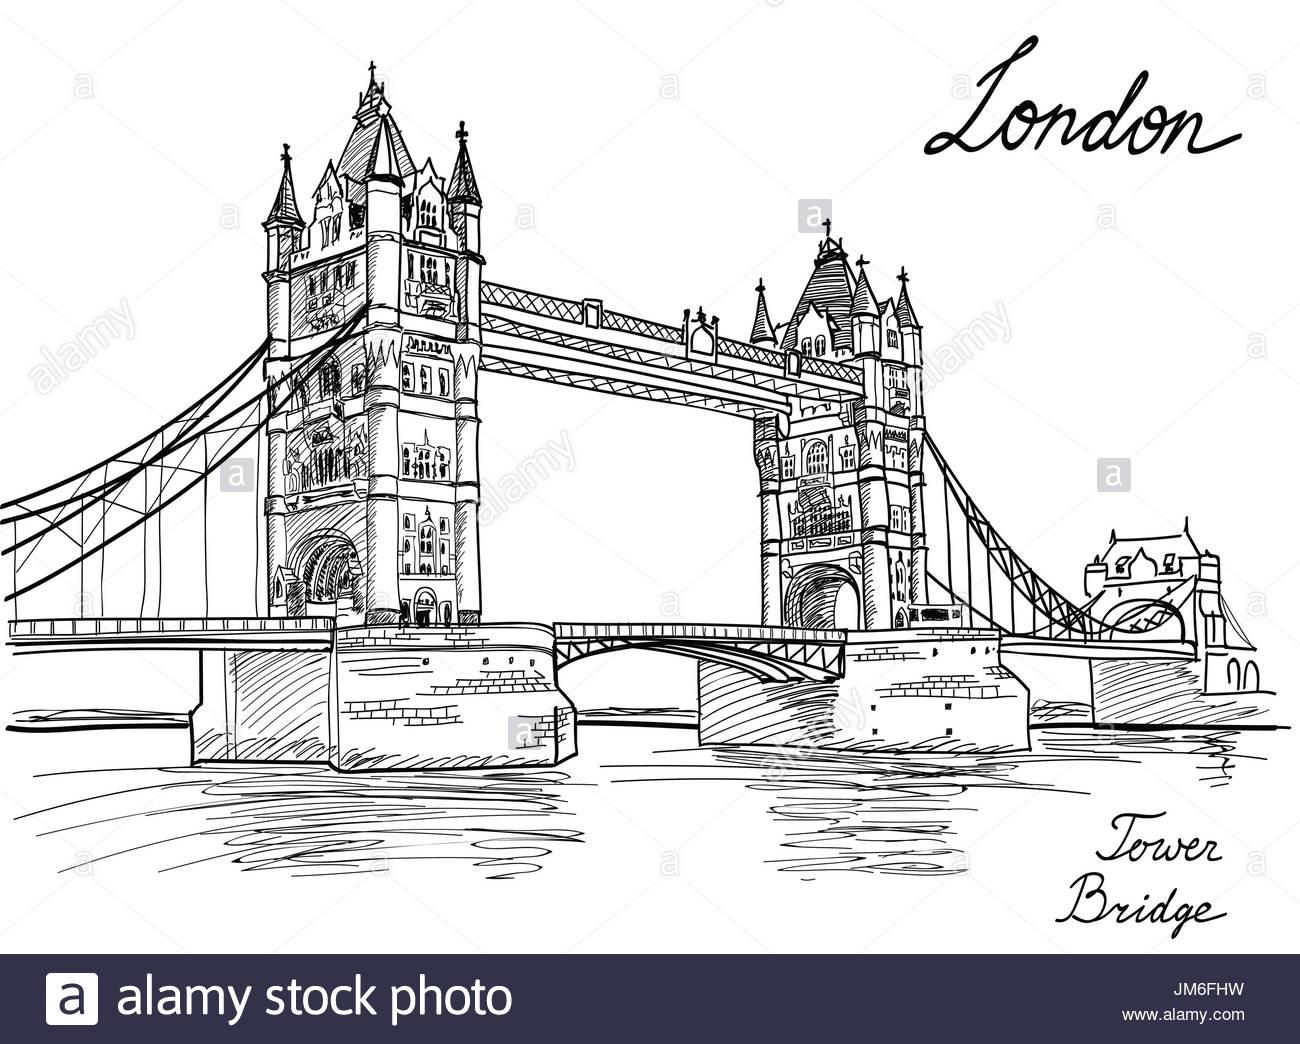 Tower Bridge, Londres, Angleterre, Royaume-Uni, Europe avec Dessin De Angleterre